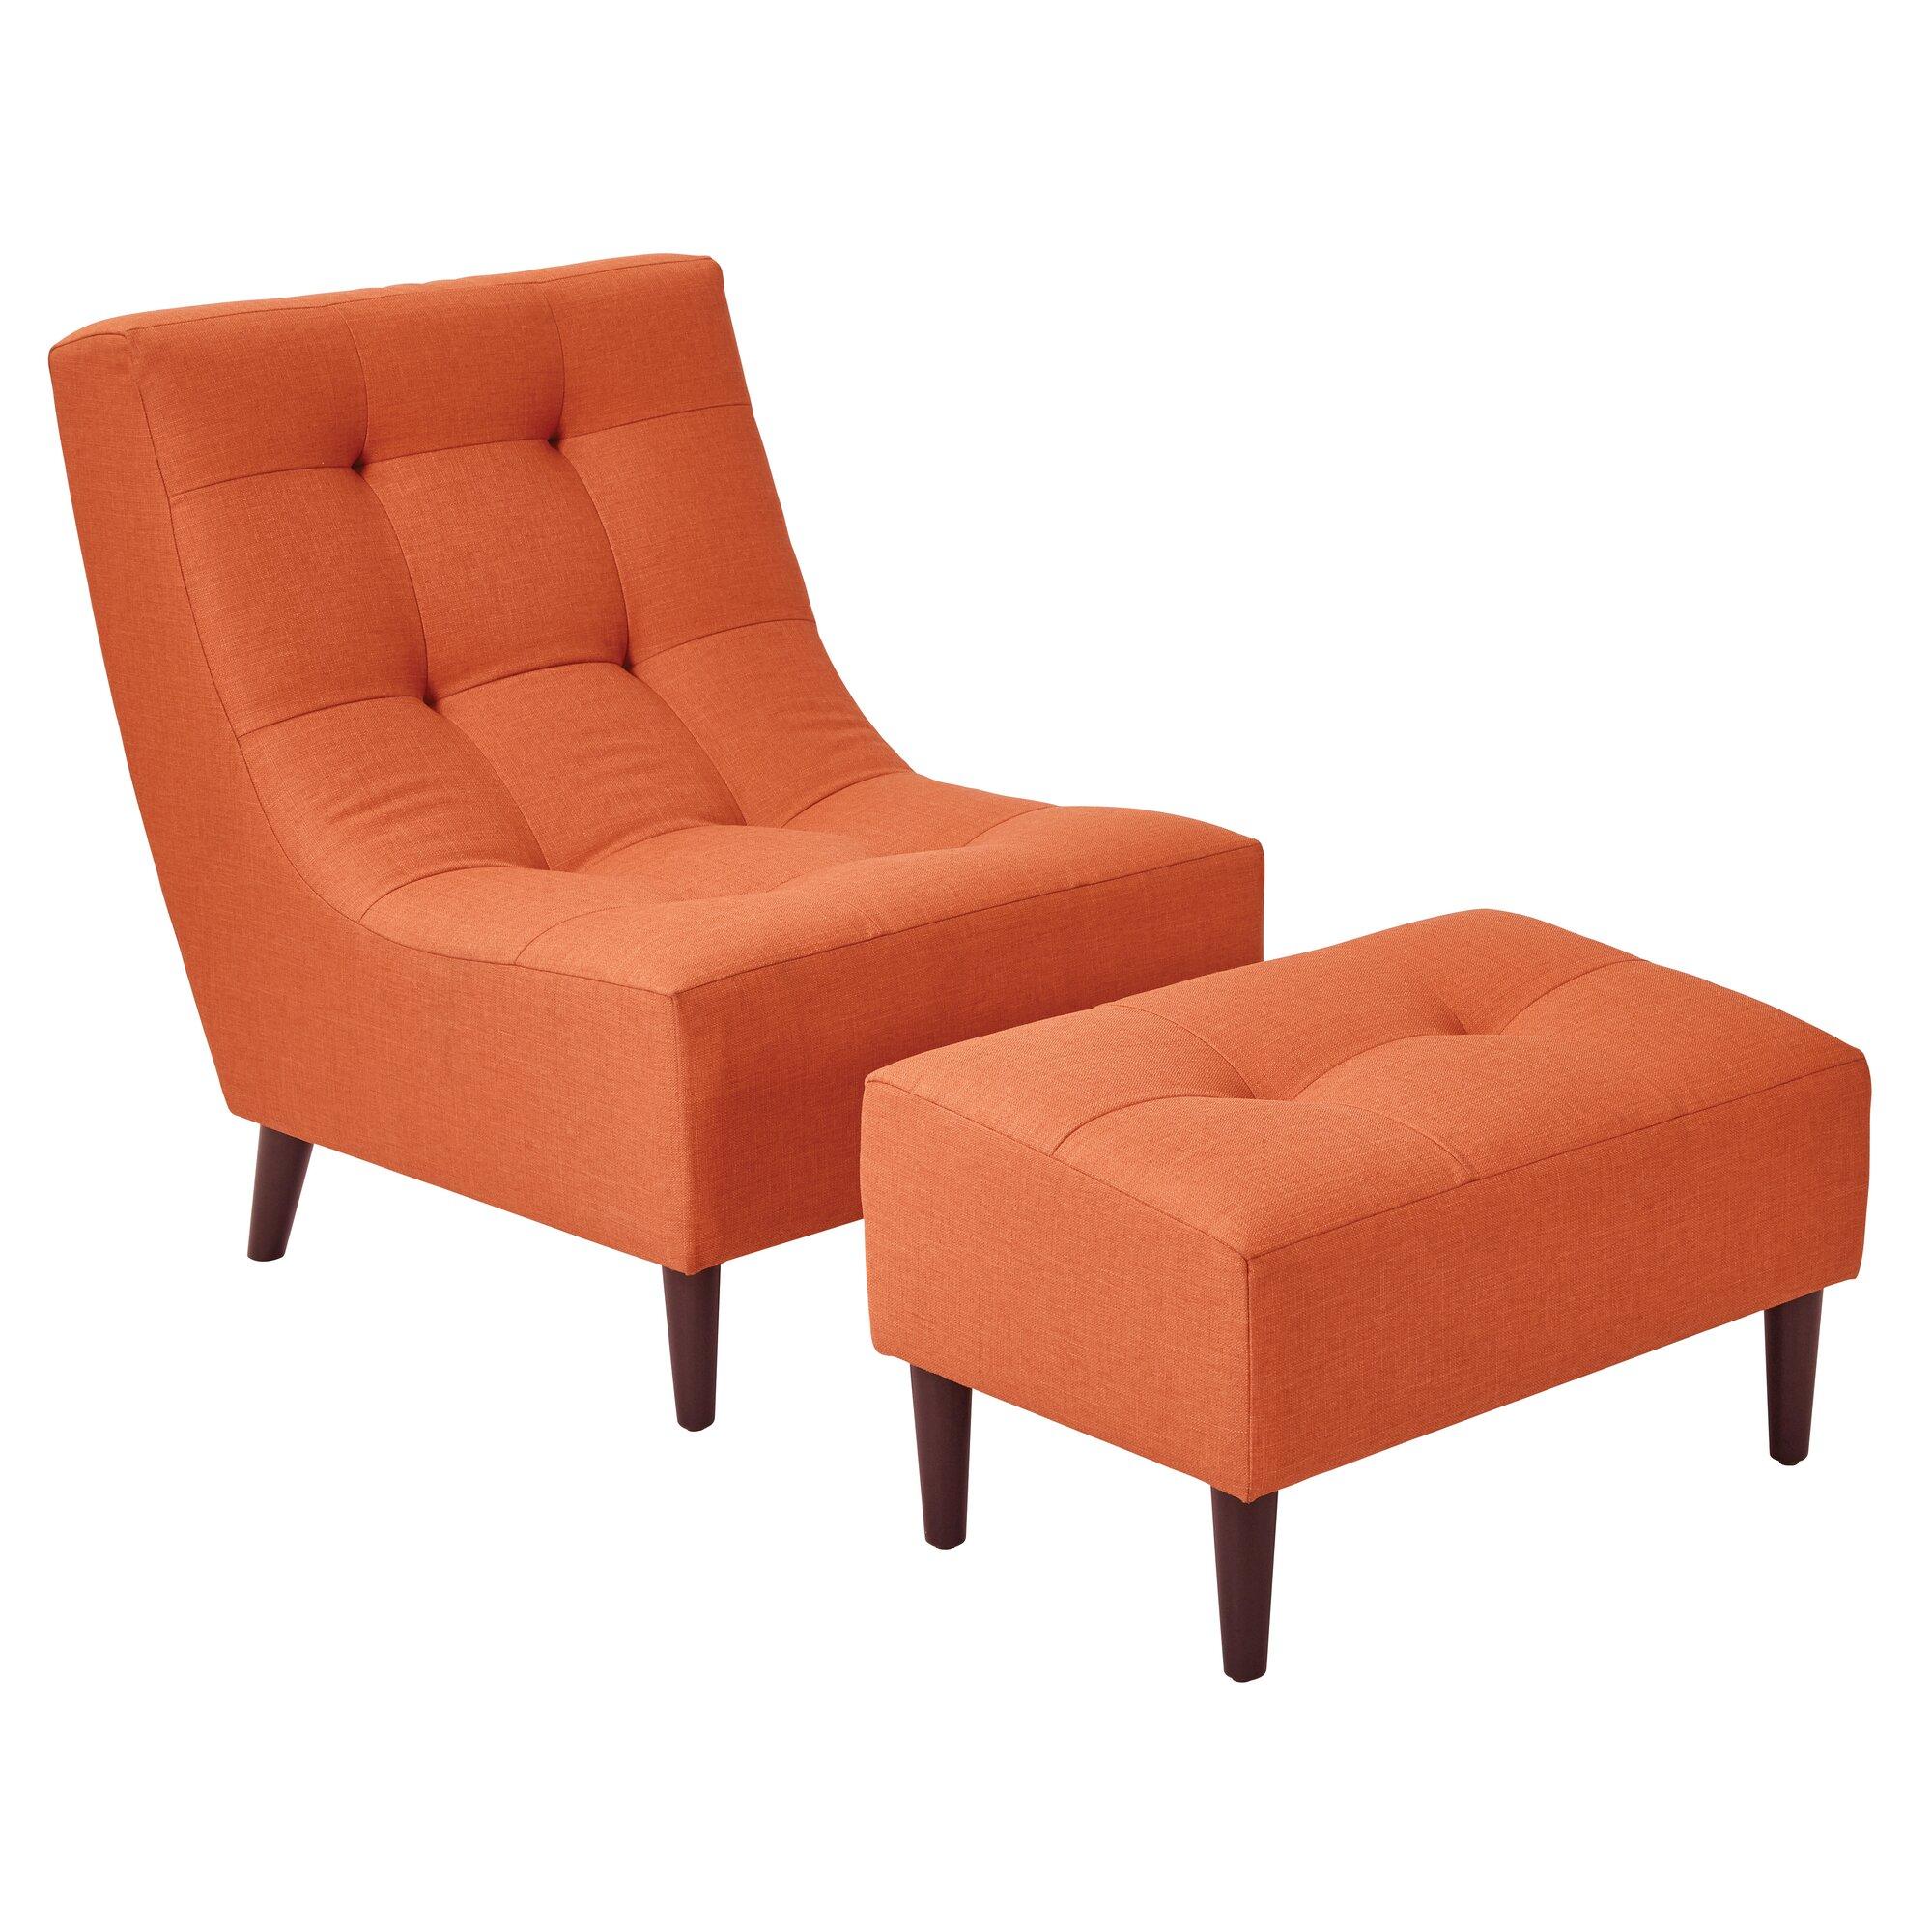 latitude run martha lounge chair and ottoman reviews wayfair. Black Bedroom Furniture Sets. Home Design Ideas